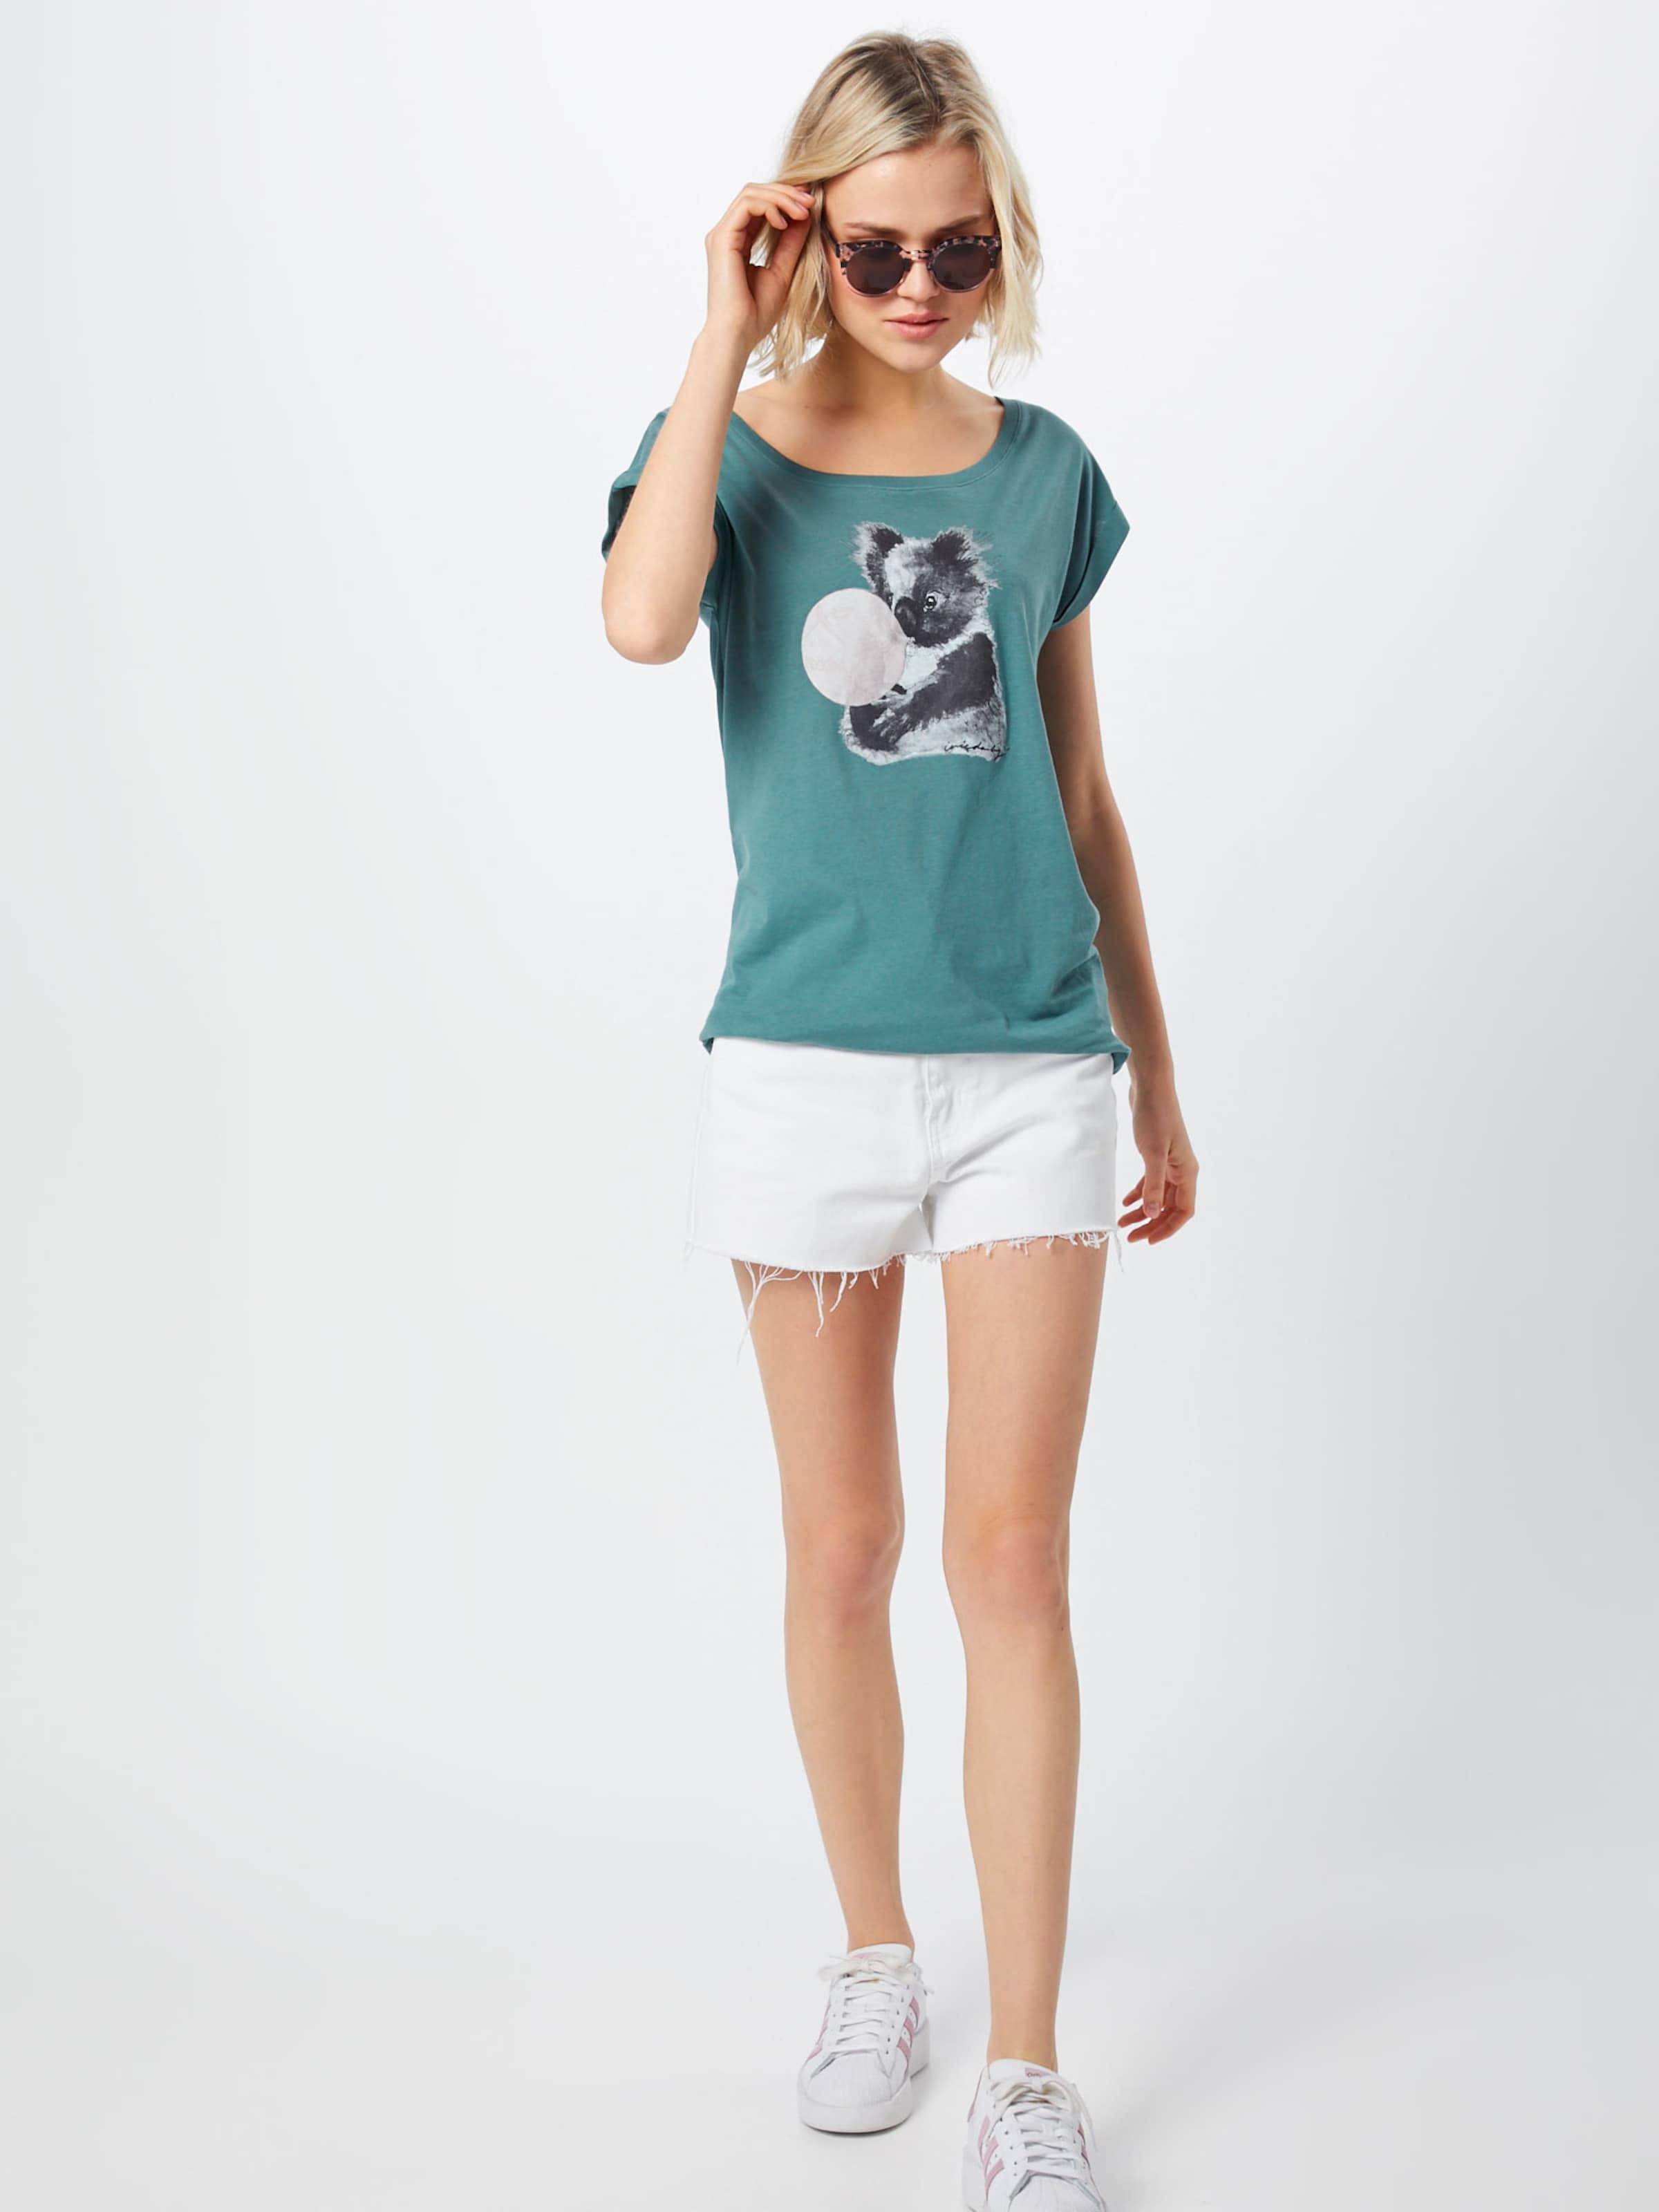 In Shirt PetrolWeiß Iriedaily 'koala Bubble Tee' JTF1lcK